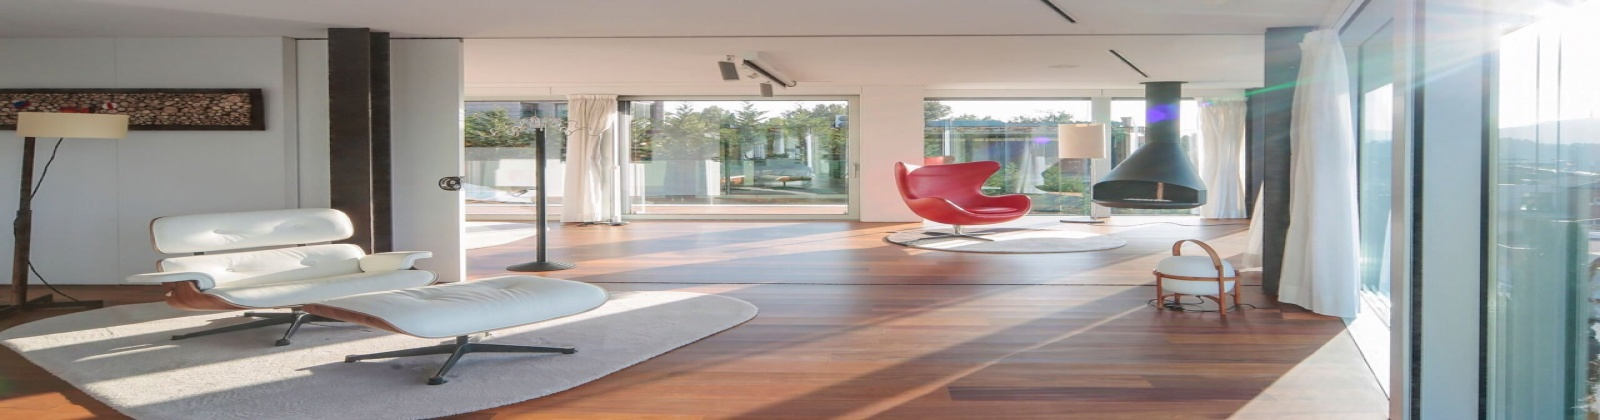 4 Bedrooms, Villa, For sale, Molins de rei, 4 Bathrooms, Listing ID 1005, Barcelona, Spain,